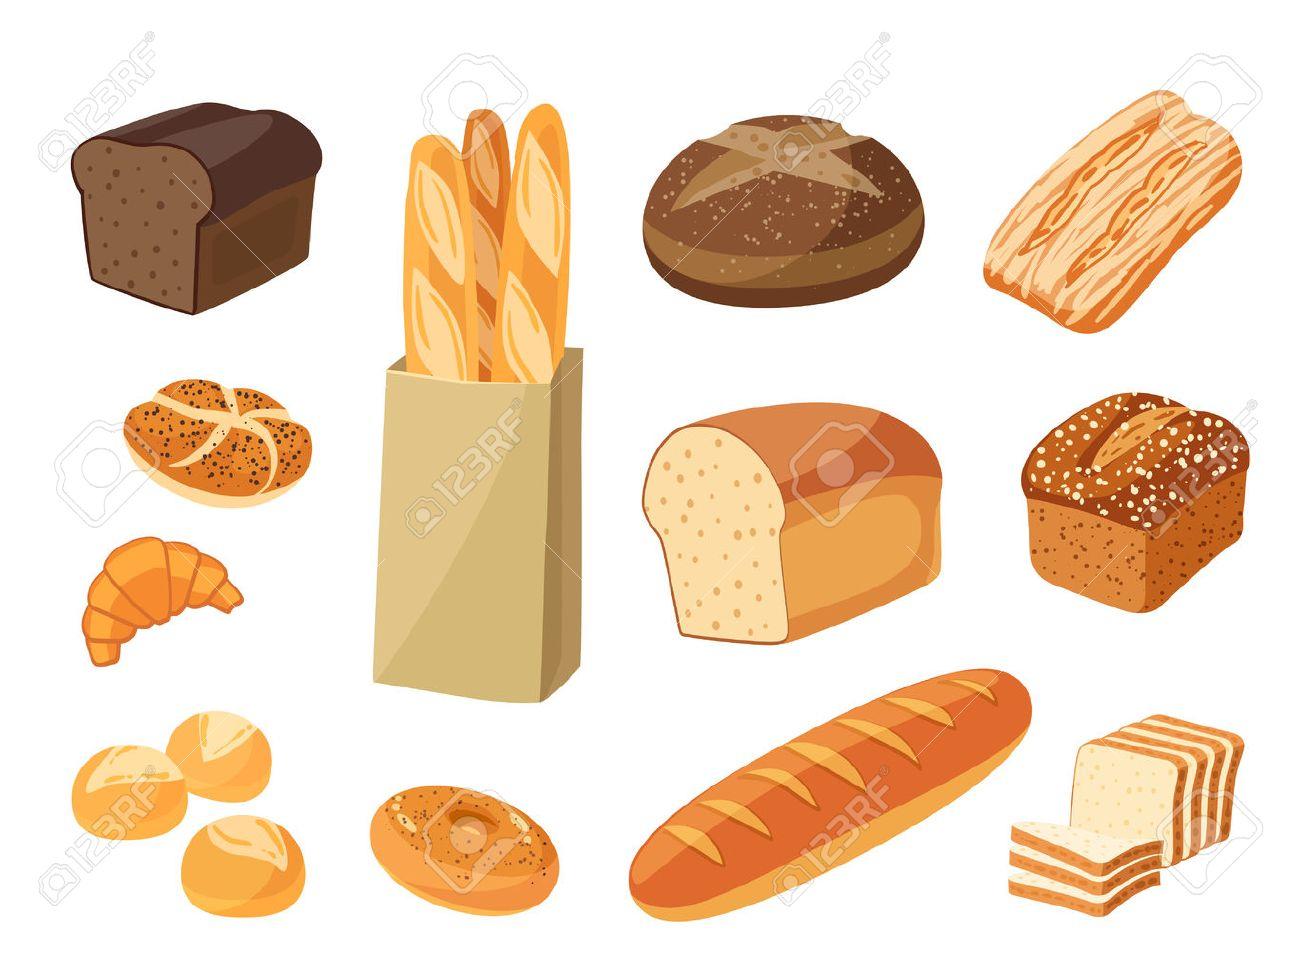 Grains clipart tasty bread. Free download clip art